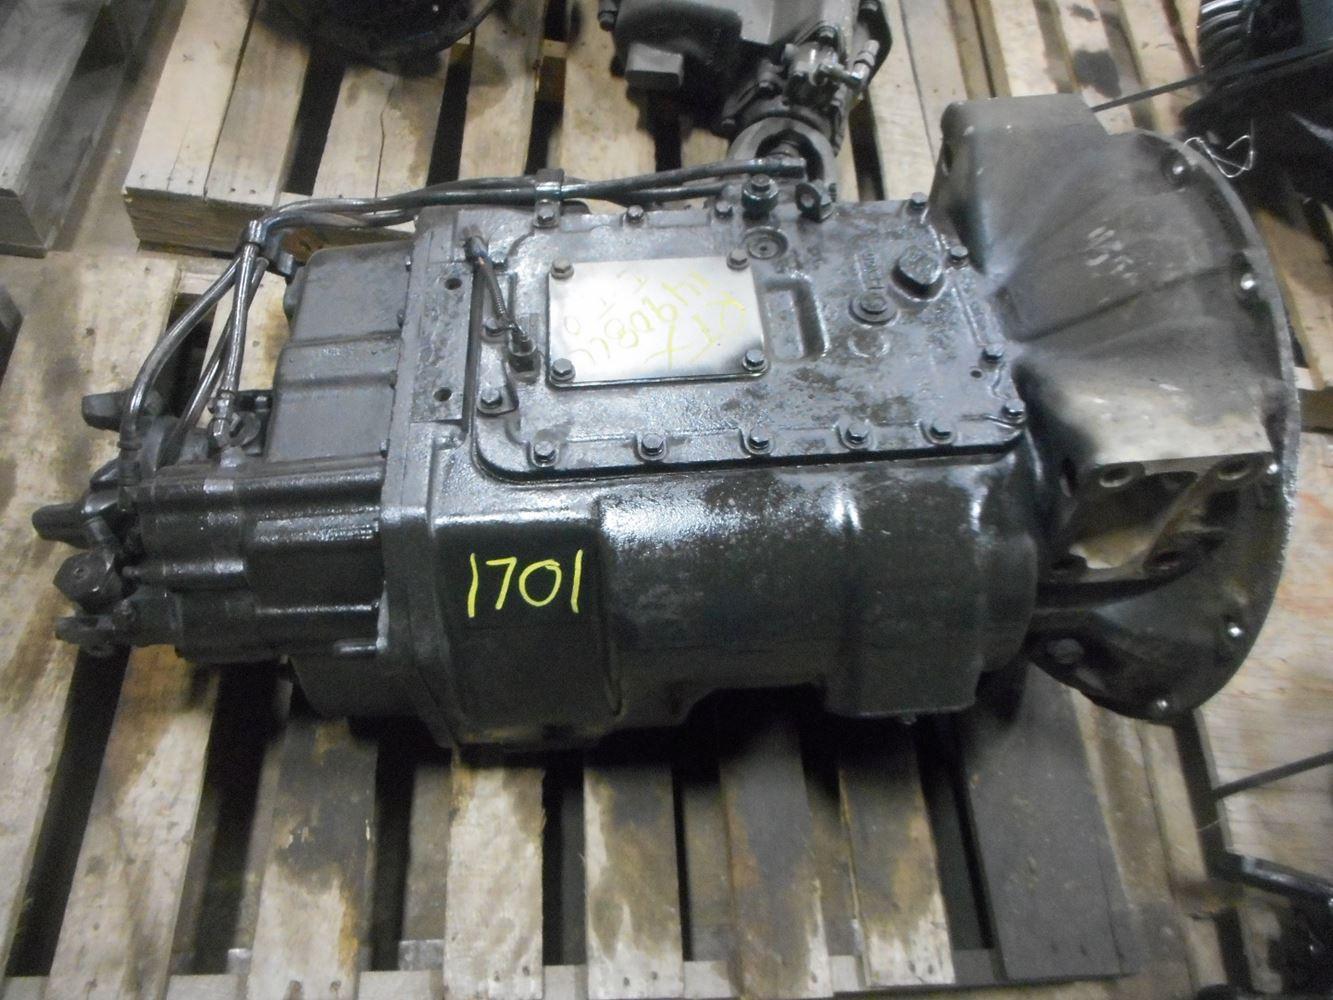 eaton fuller heavy duty transmissions service manual